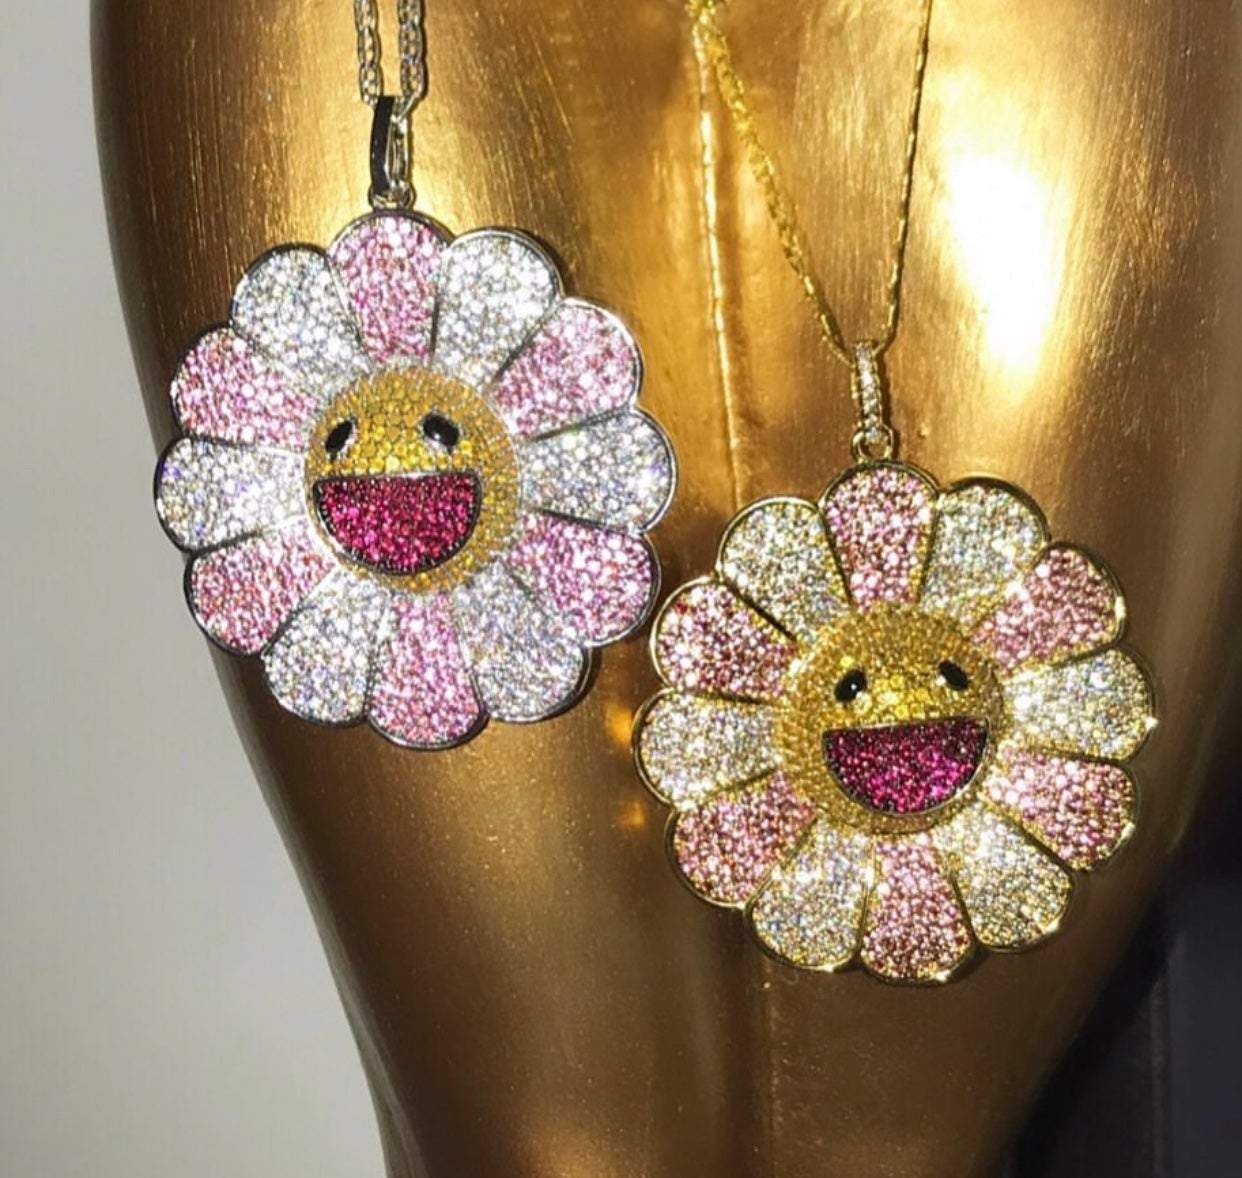 Barbie cuban link necklace in 2020 Cuban link necklace